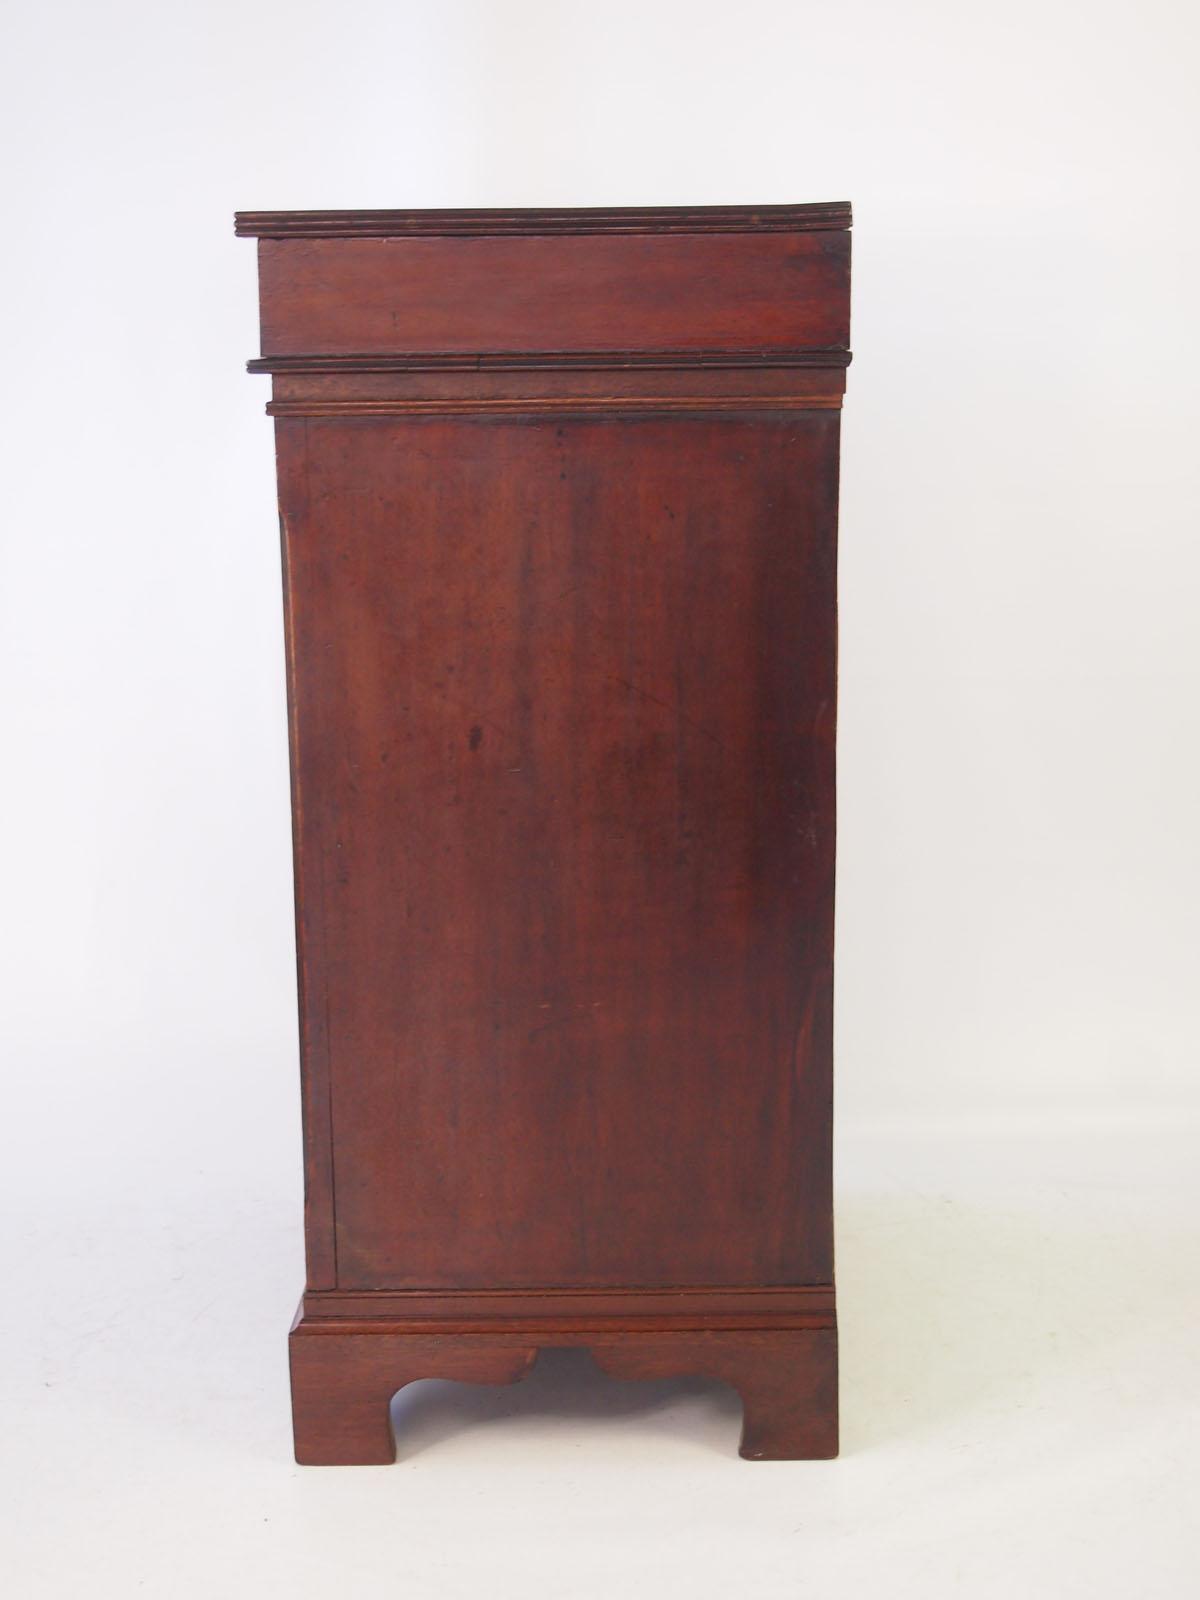 Small Mahogany Music Cabinet Cupboard